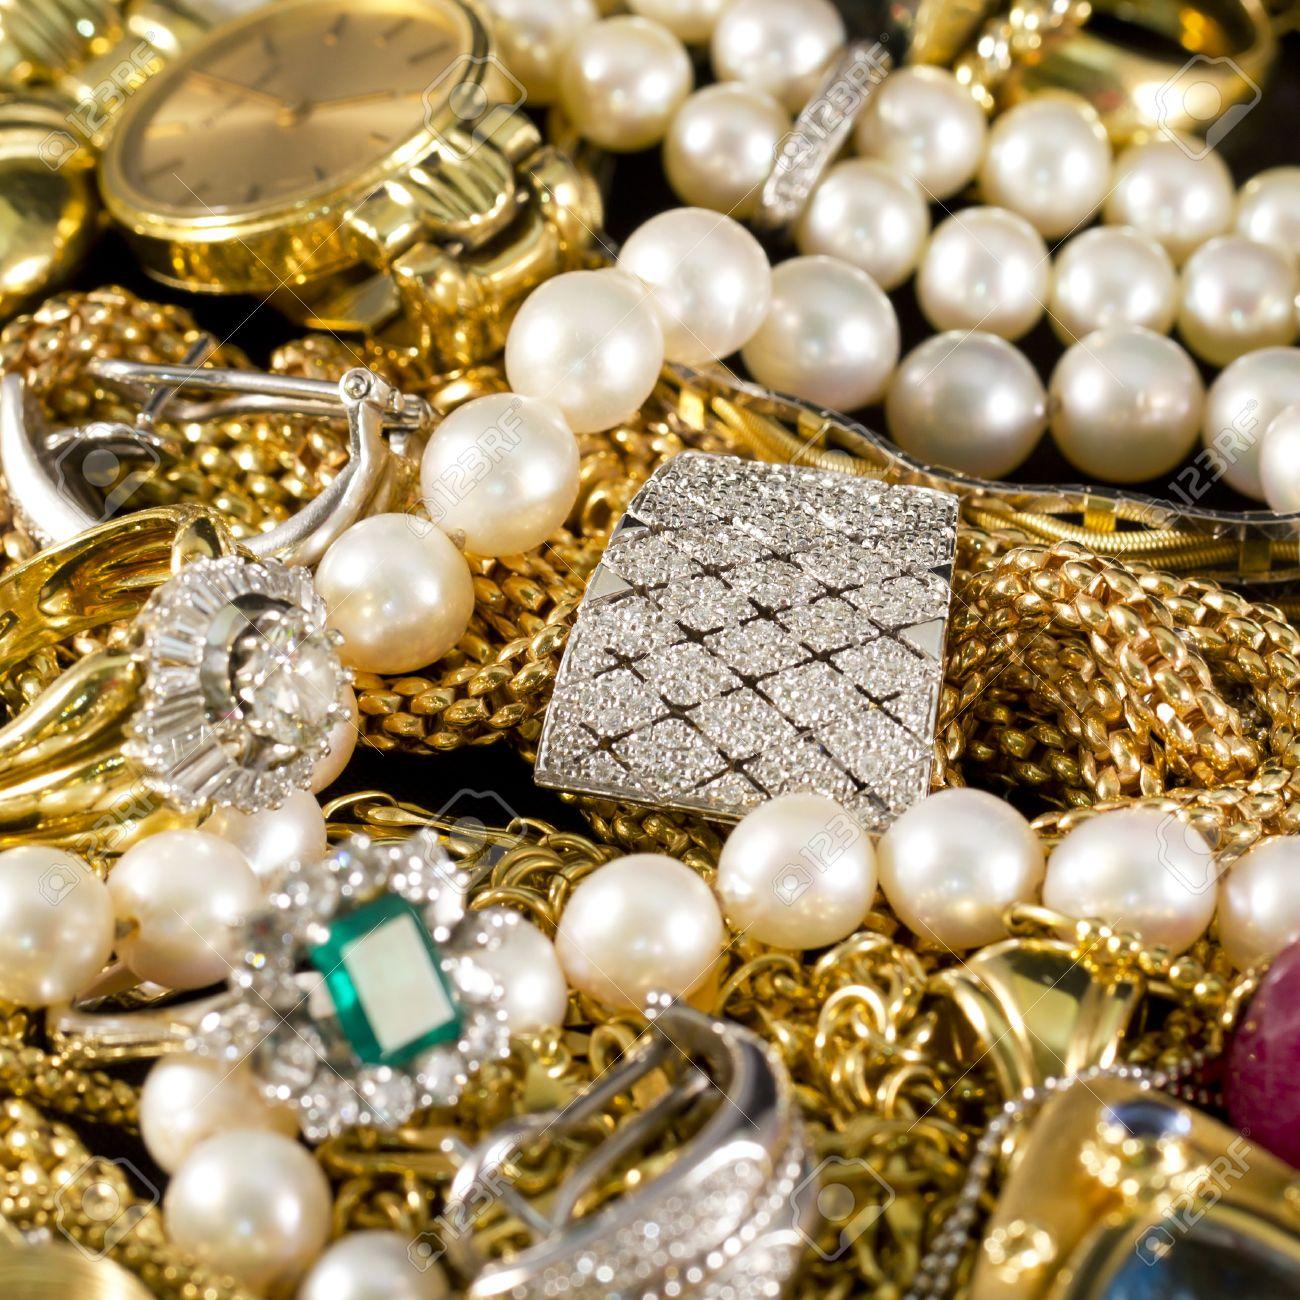 3f6e67e42f07 Foto de archivo - Primer plano de la joyería de oro con piedras preciosas